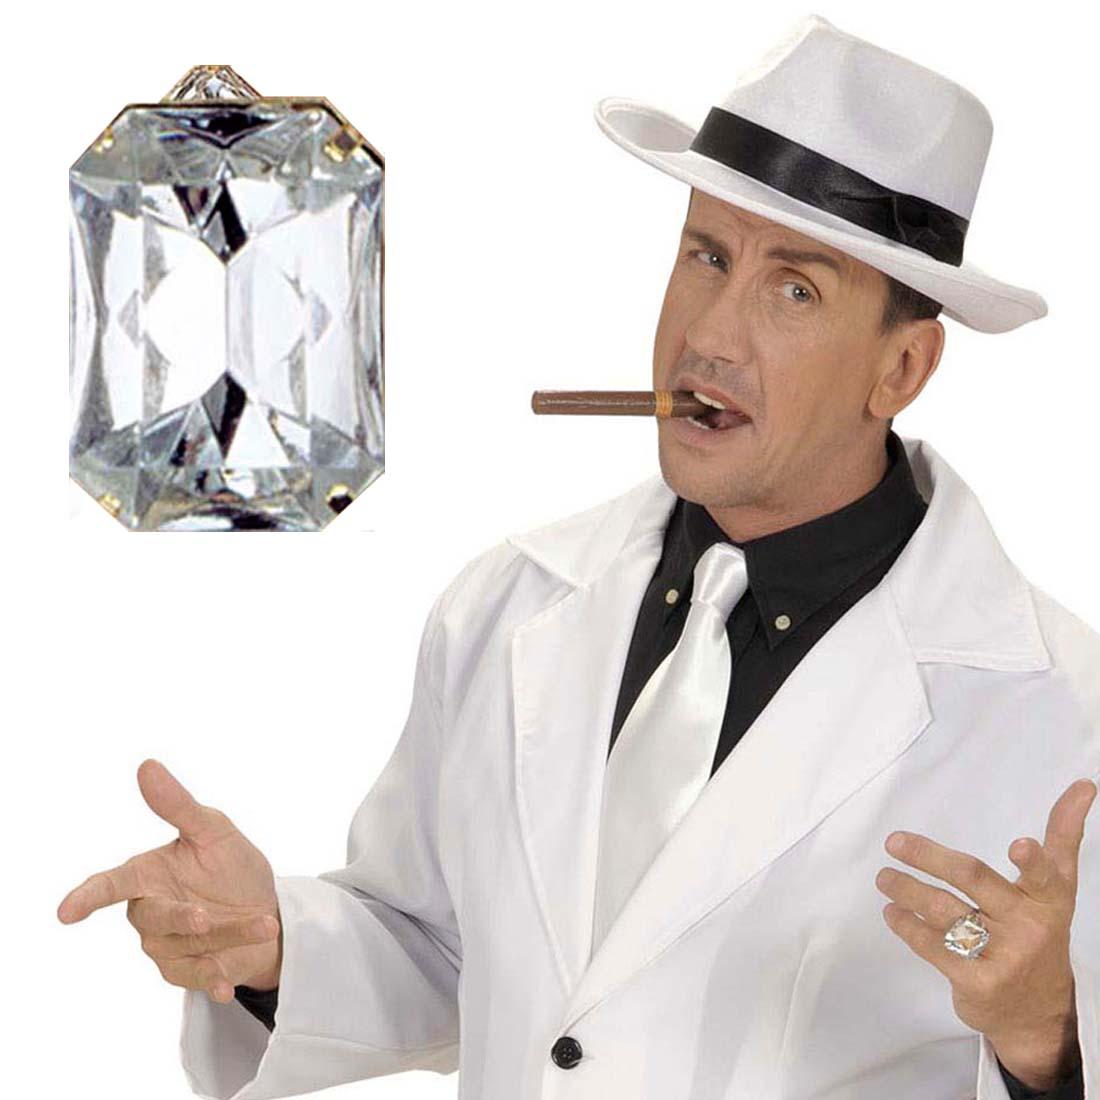 pimp ring diamant klunker strassring zuh lter schmuck diamantring accessoire ebay. Black Bedroom Furniture Sets. Home Design Ideas